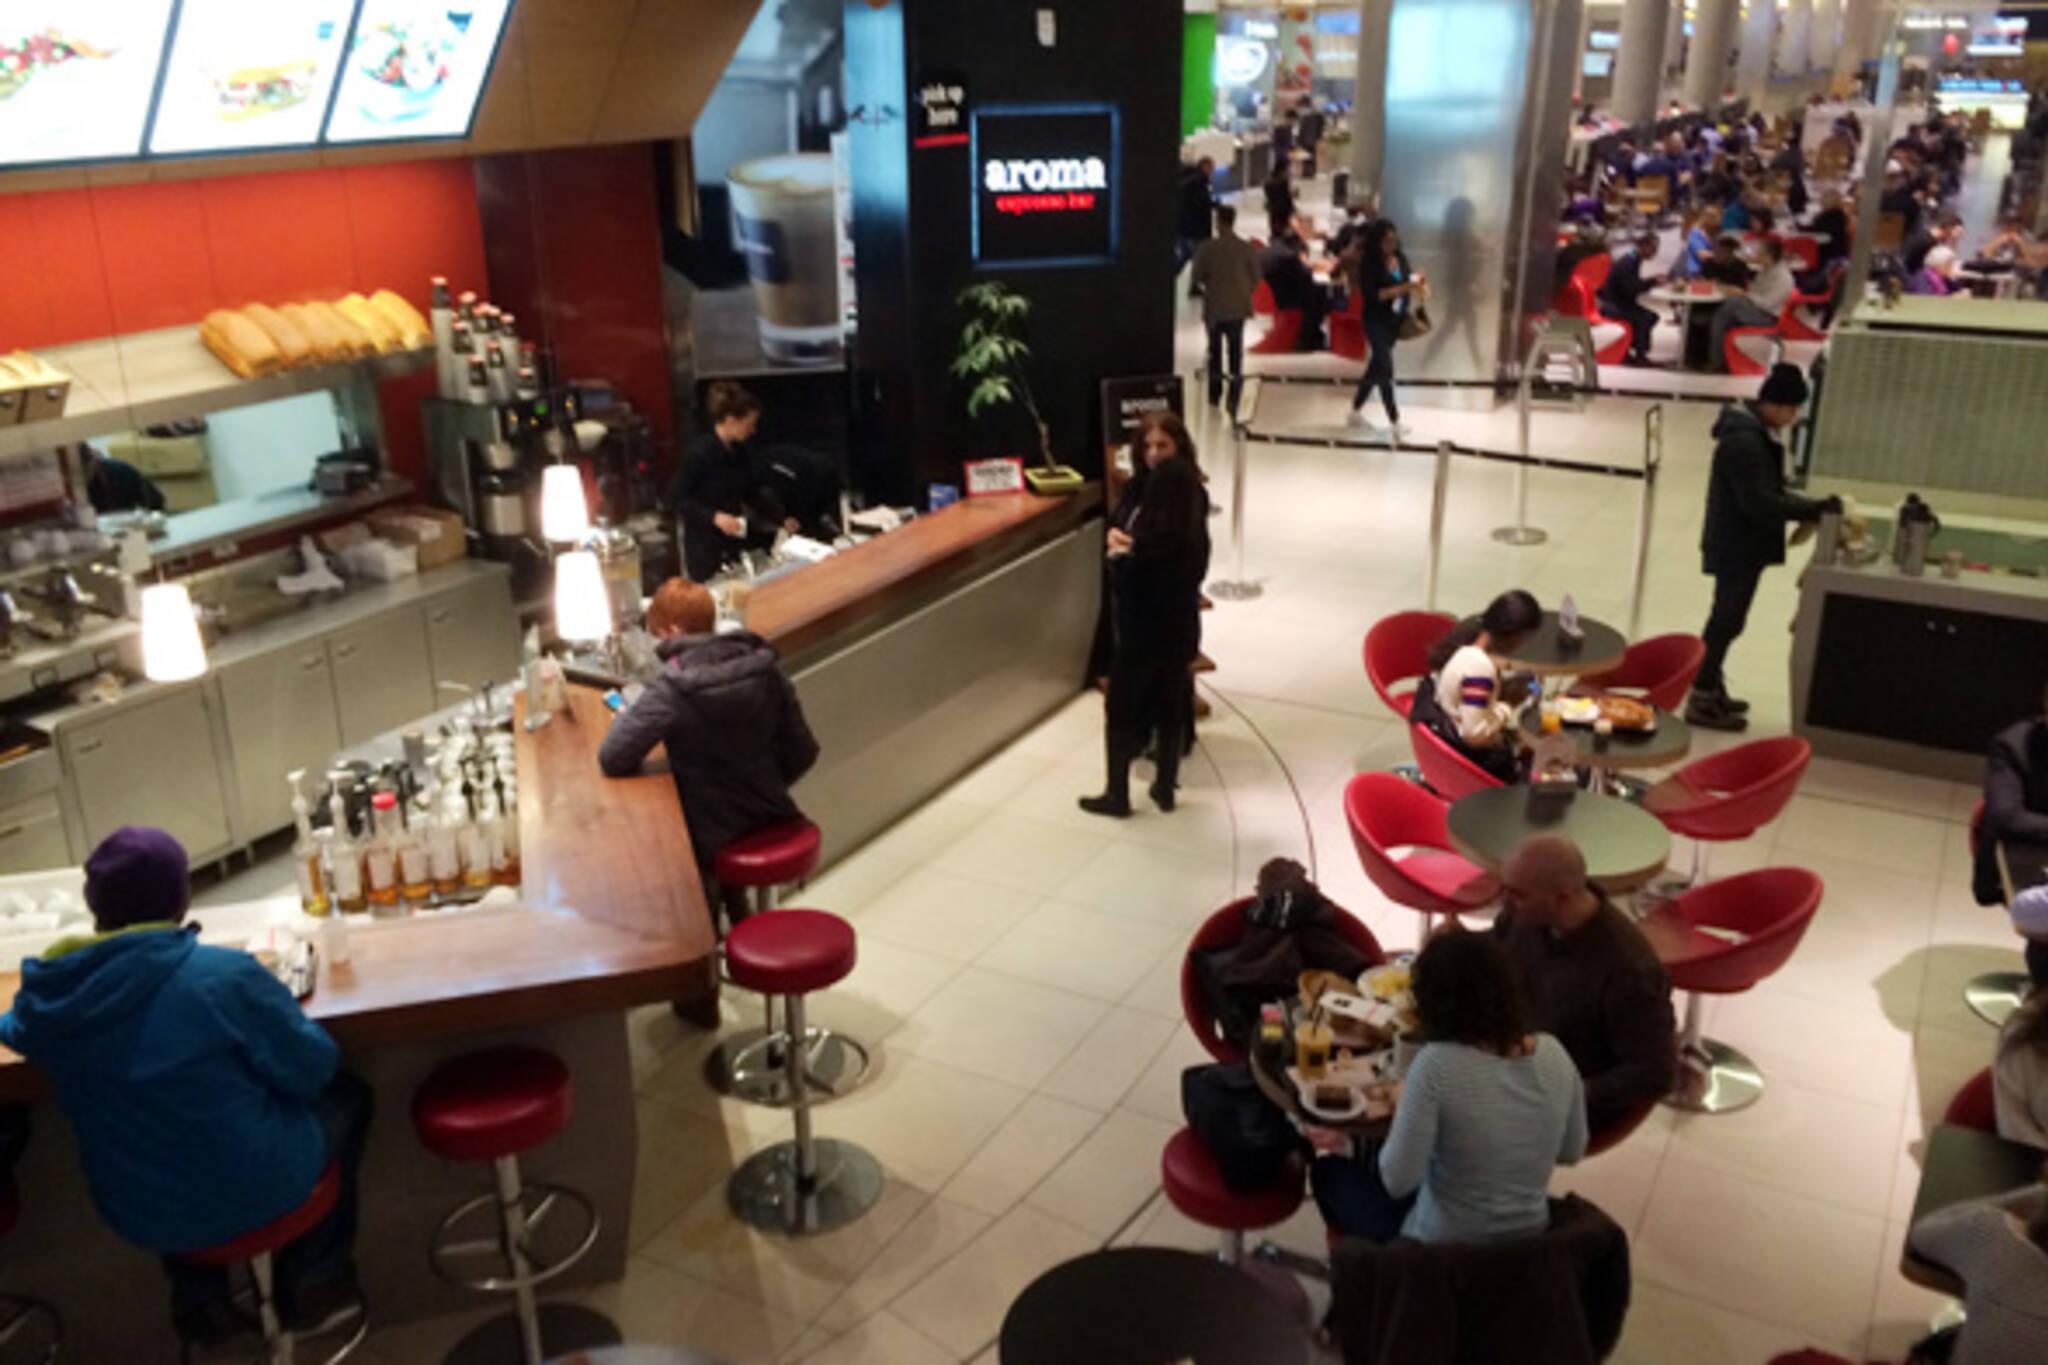 Aroma Espresso Bar eaton centre